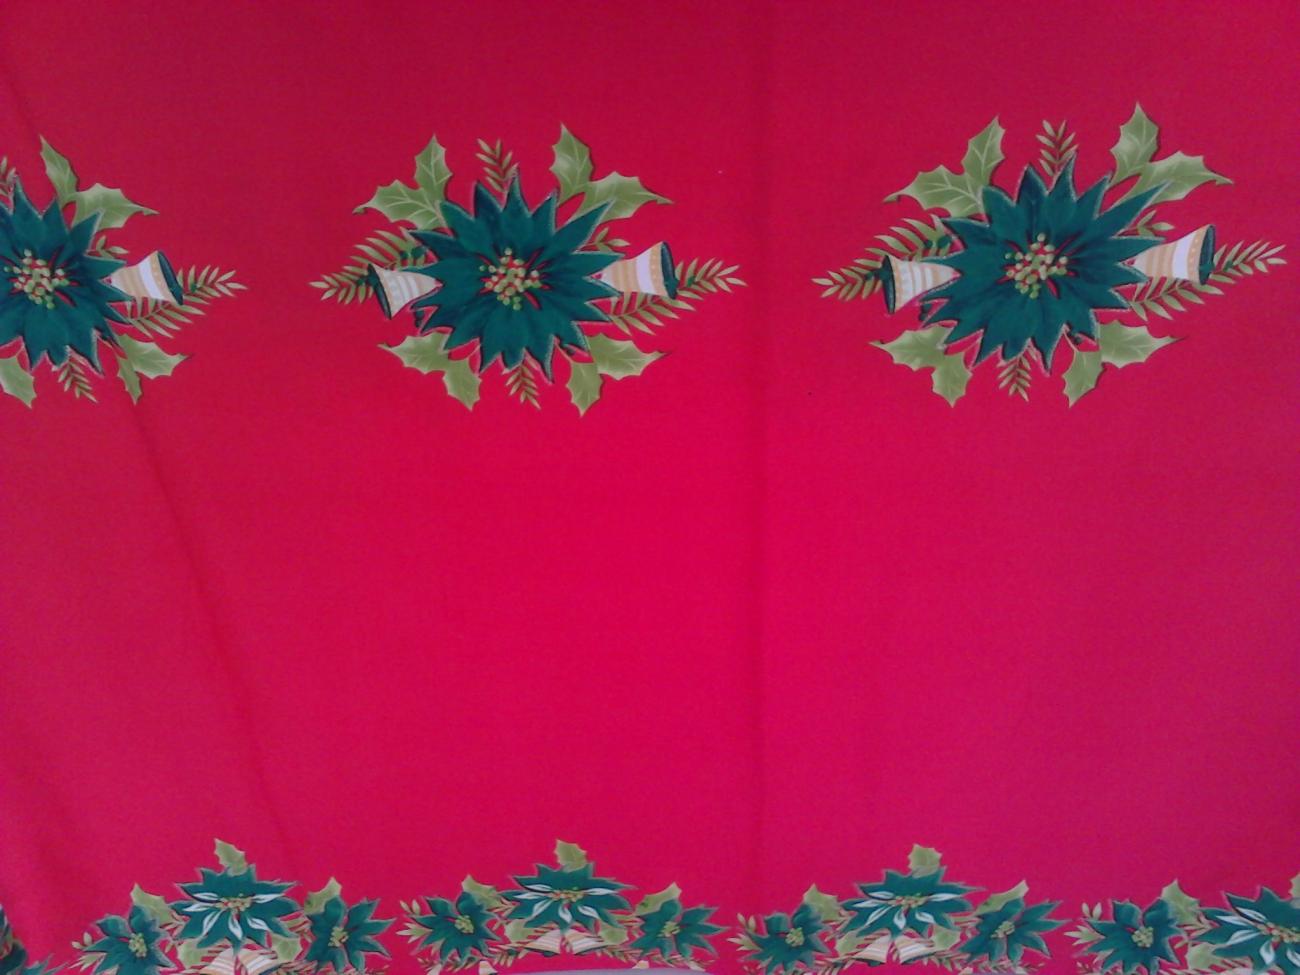 Toalha de Banquete Natalina Vermelha Barra Flor